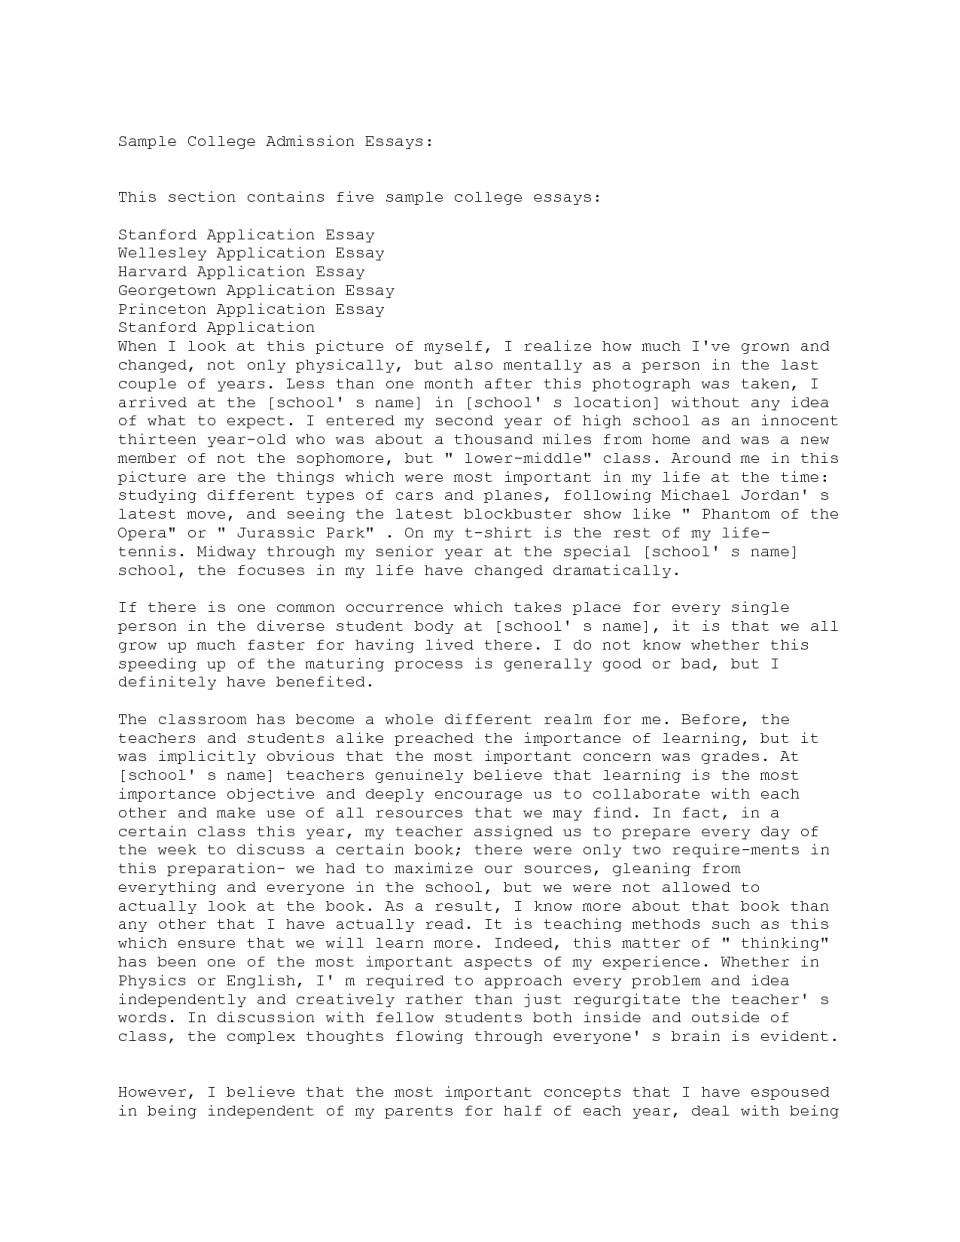 Self assessment report nba 2013 mix